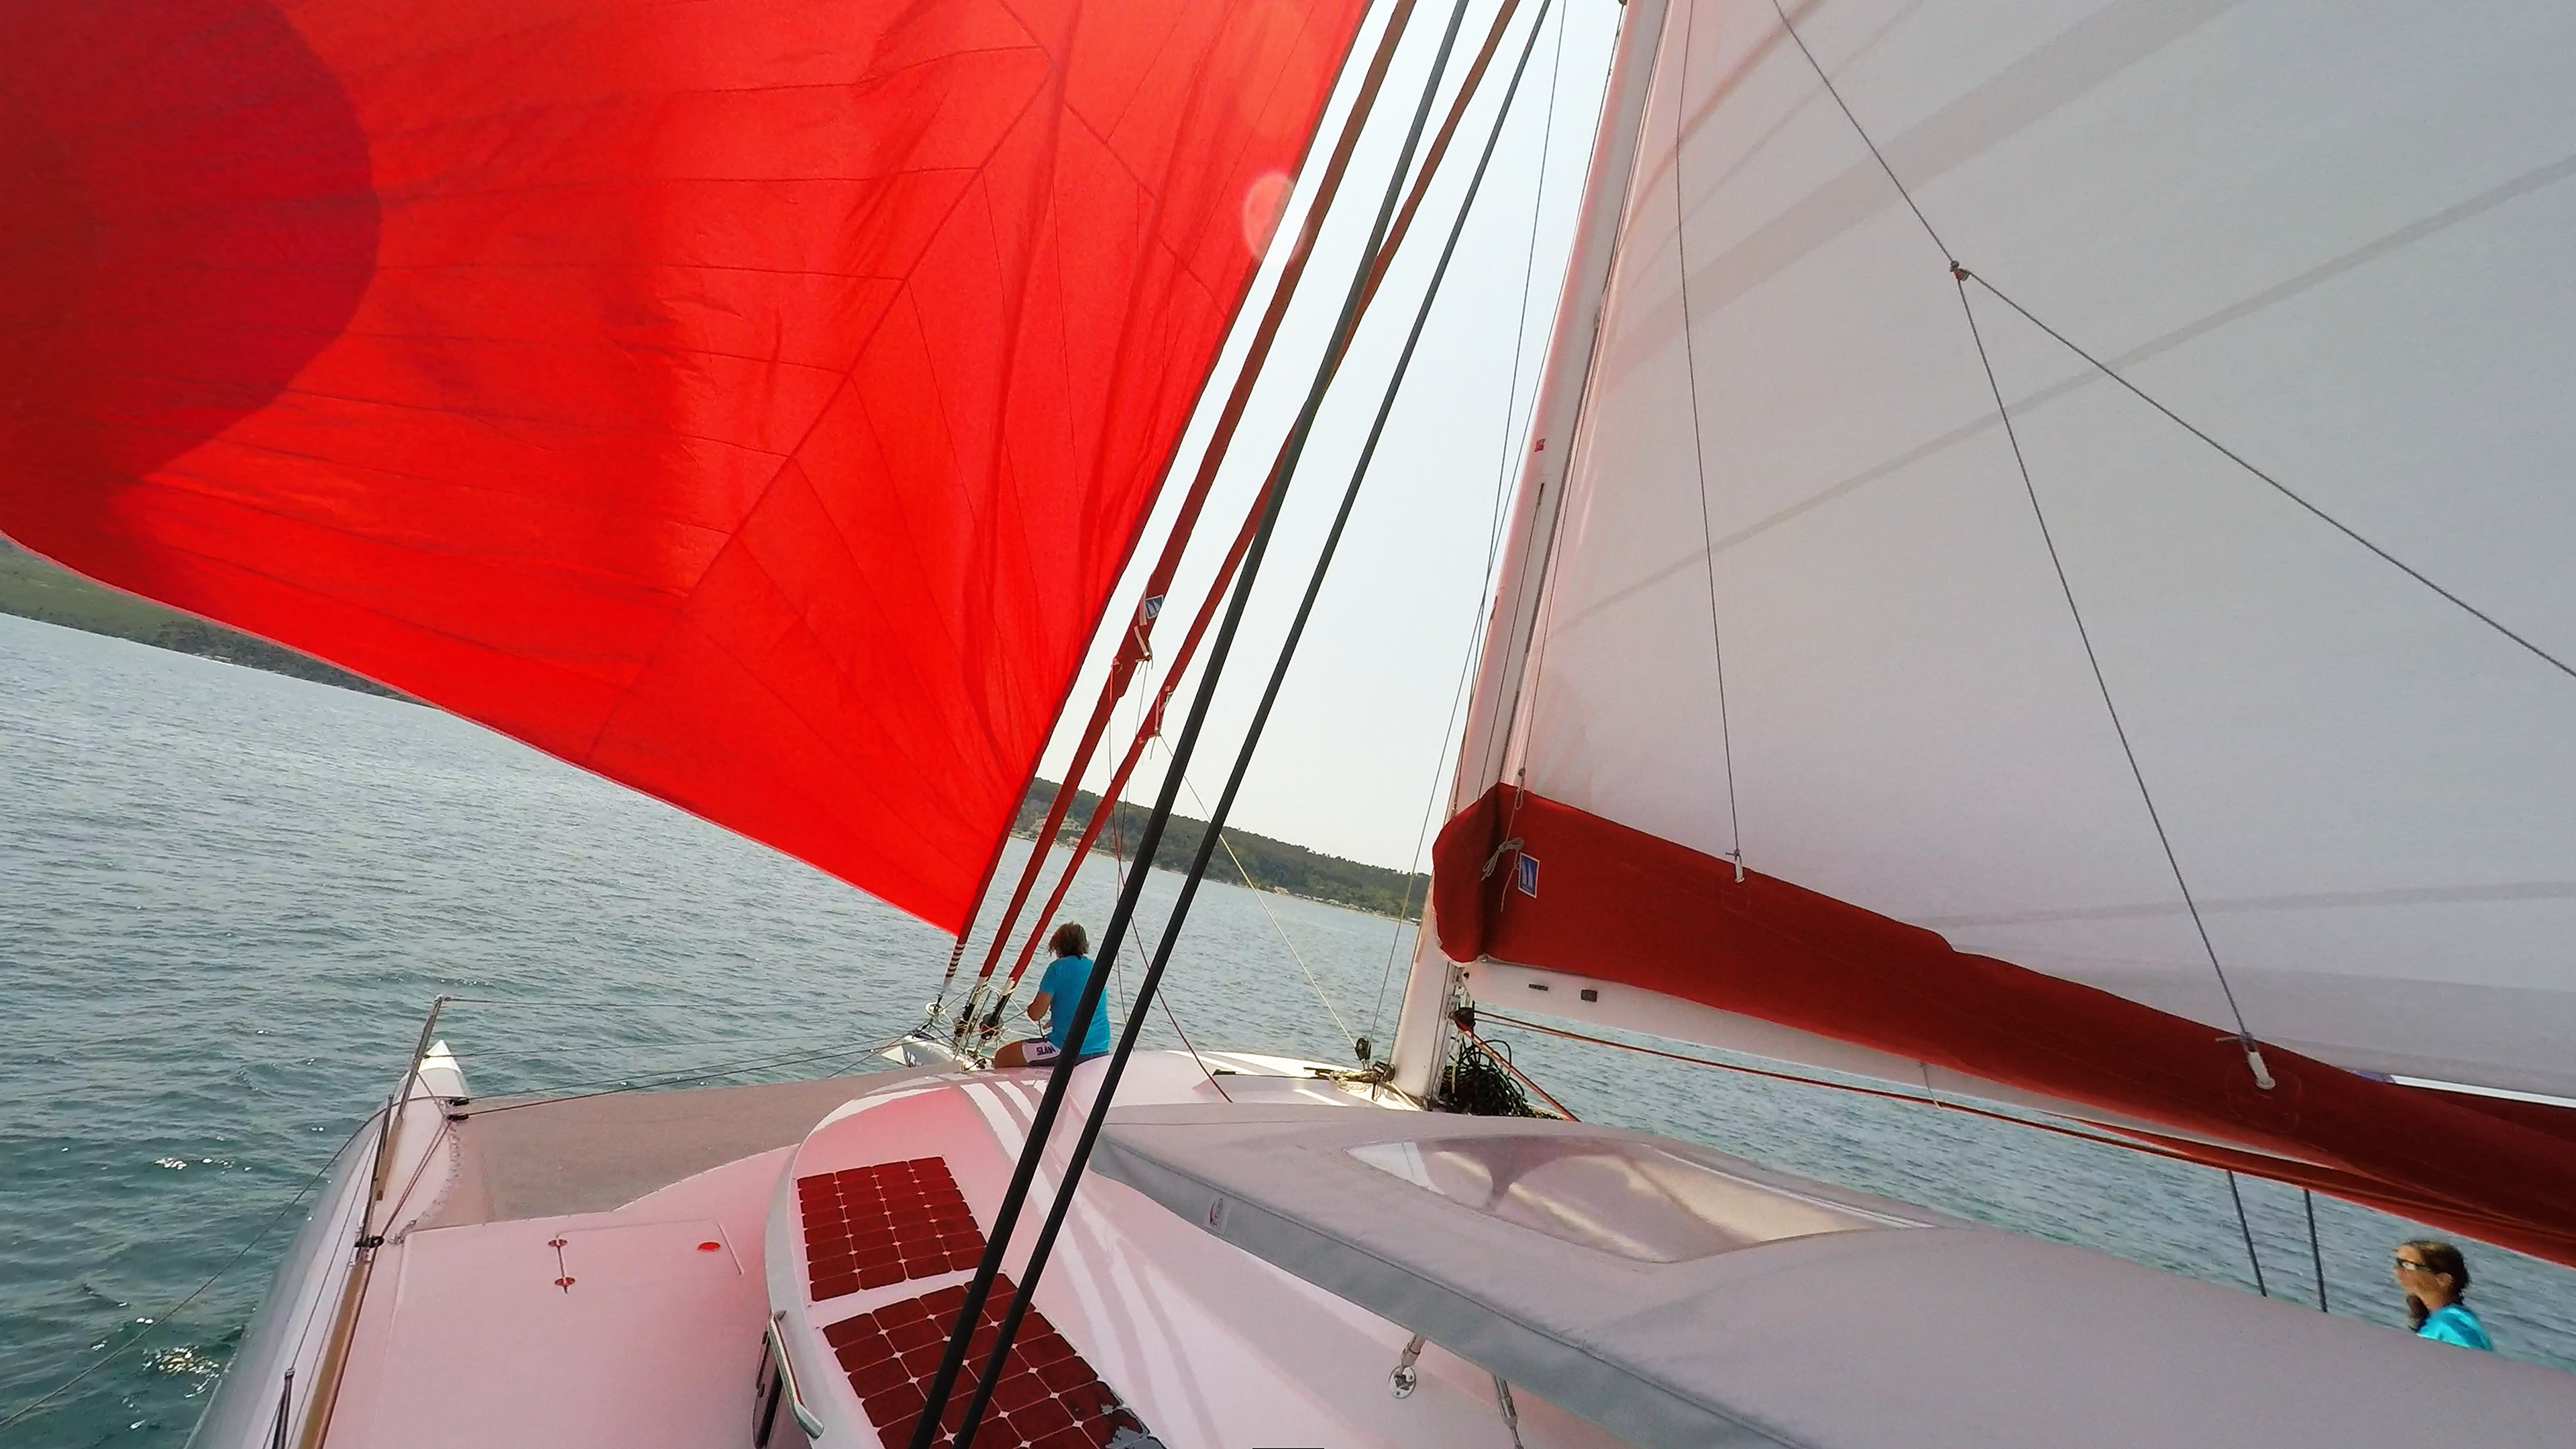 skipper sulla prua pruaman trimarano neel 45 vela vela coperta